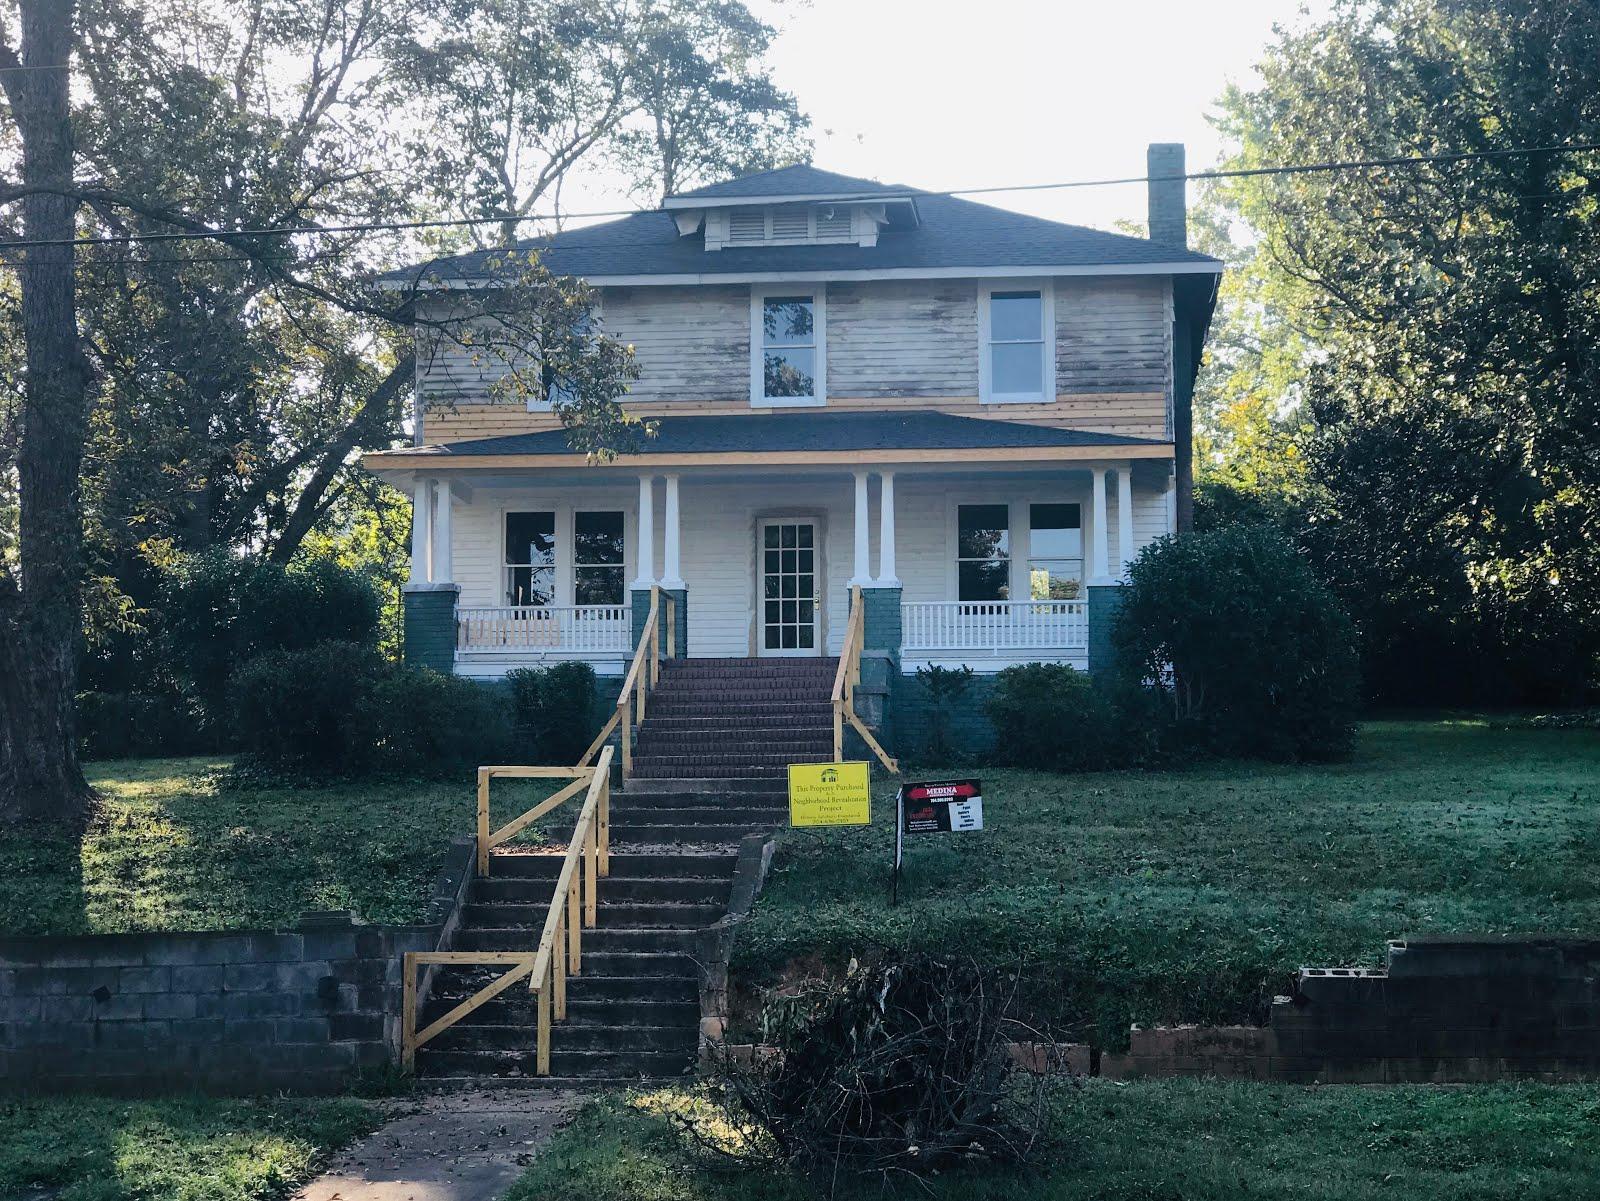 1013 N. Main Street, Salisbury NC 28144 ~ Circa 1923 ~ $69,900